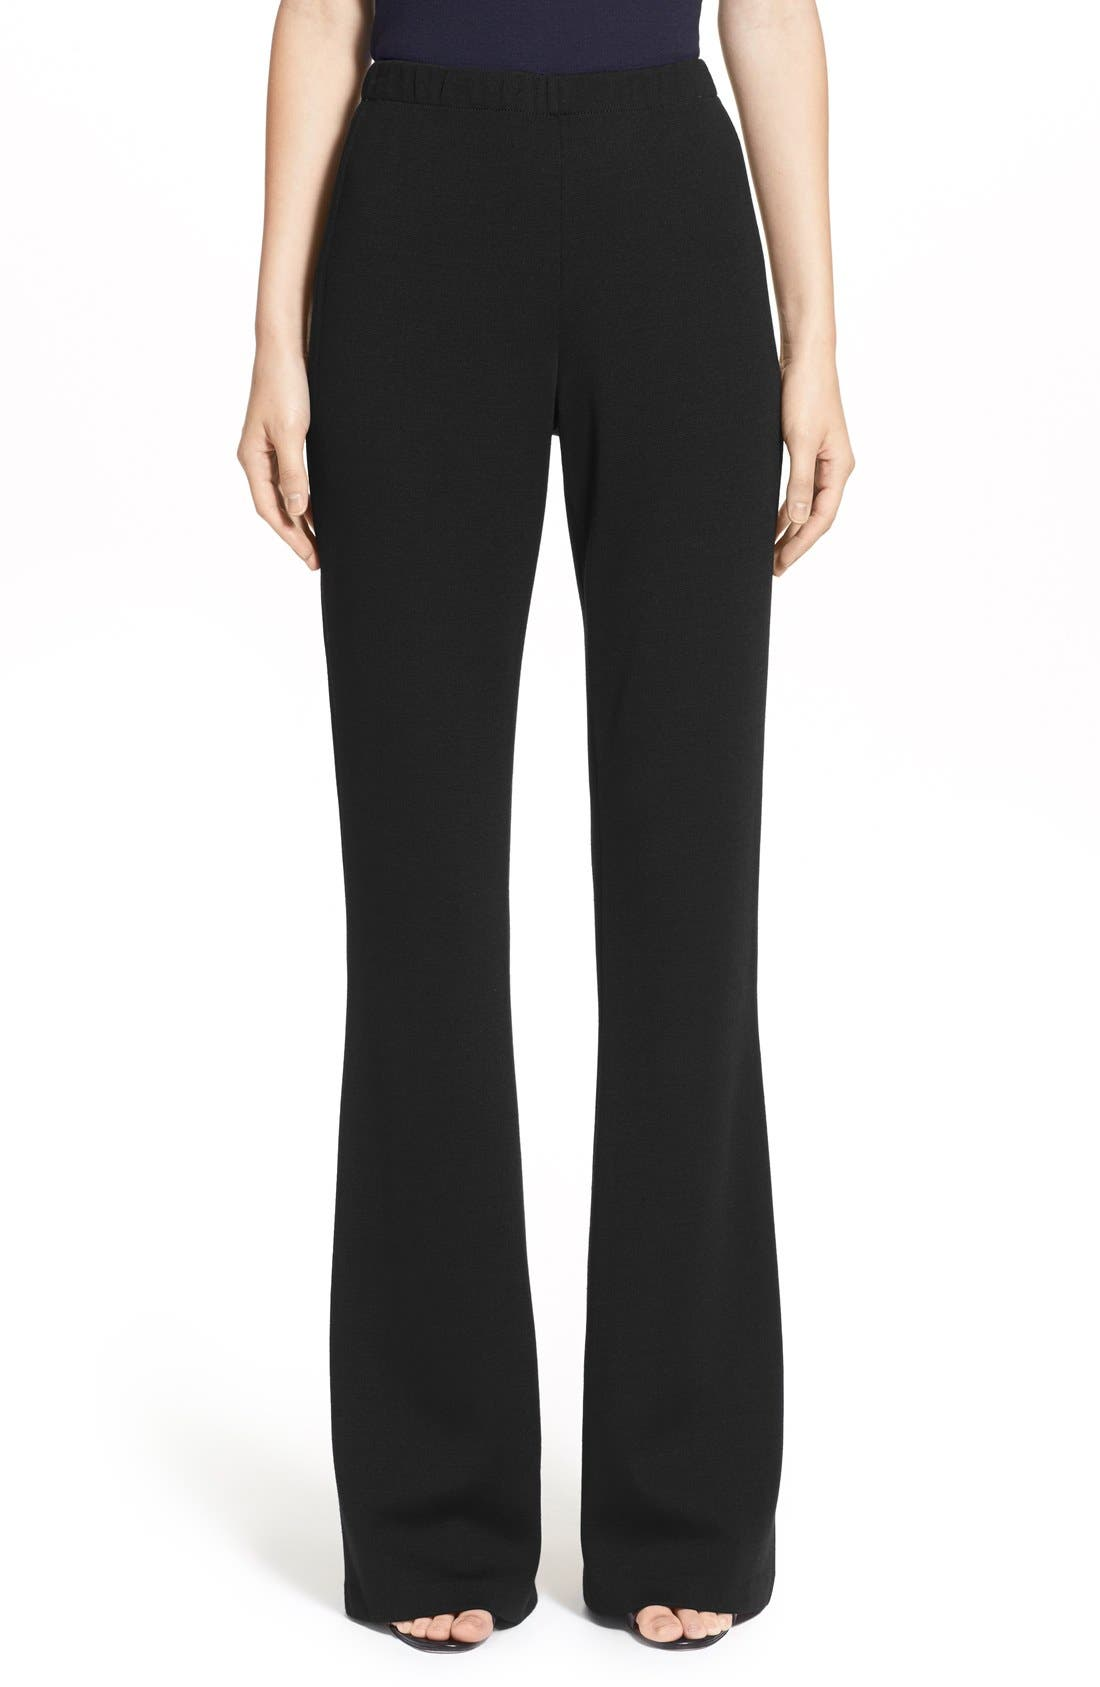 St. John Collection 'Kasia' Bootcut Milano Knit Pants